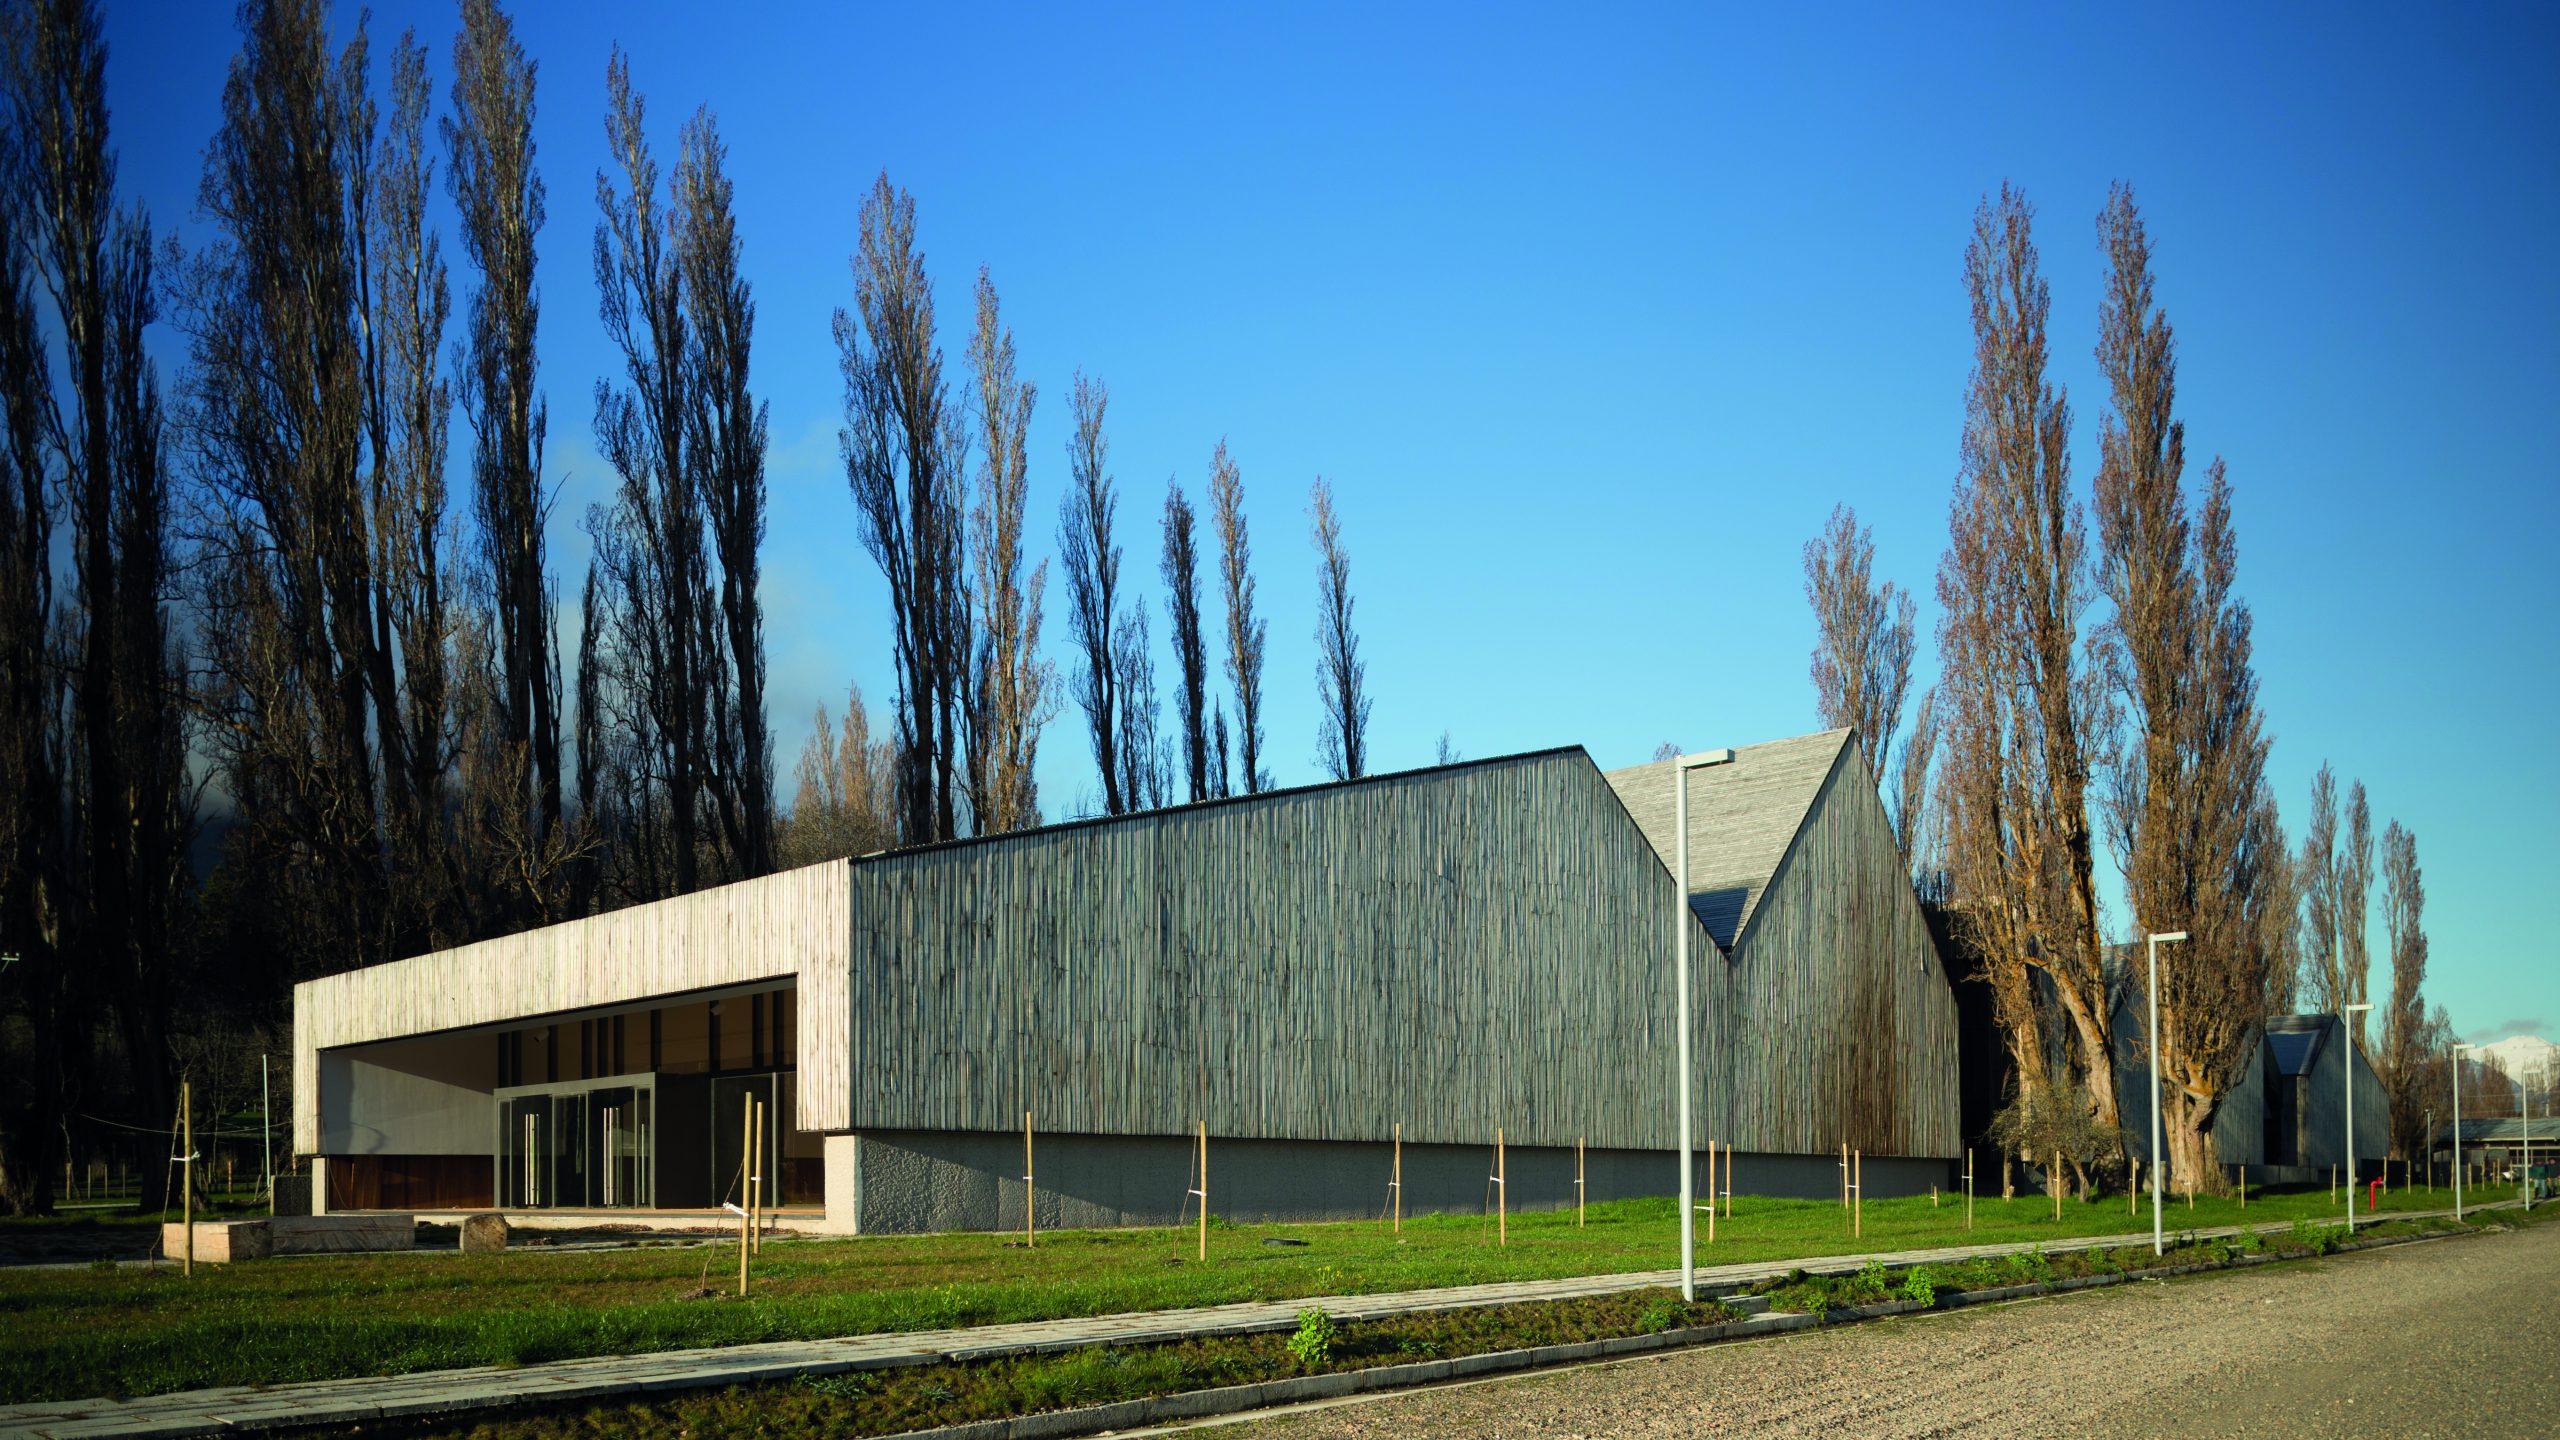 Museo Regional de Aysén: Patrimonio mágico